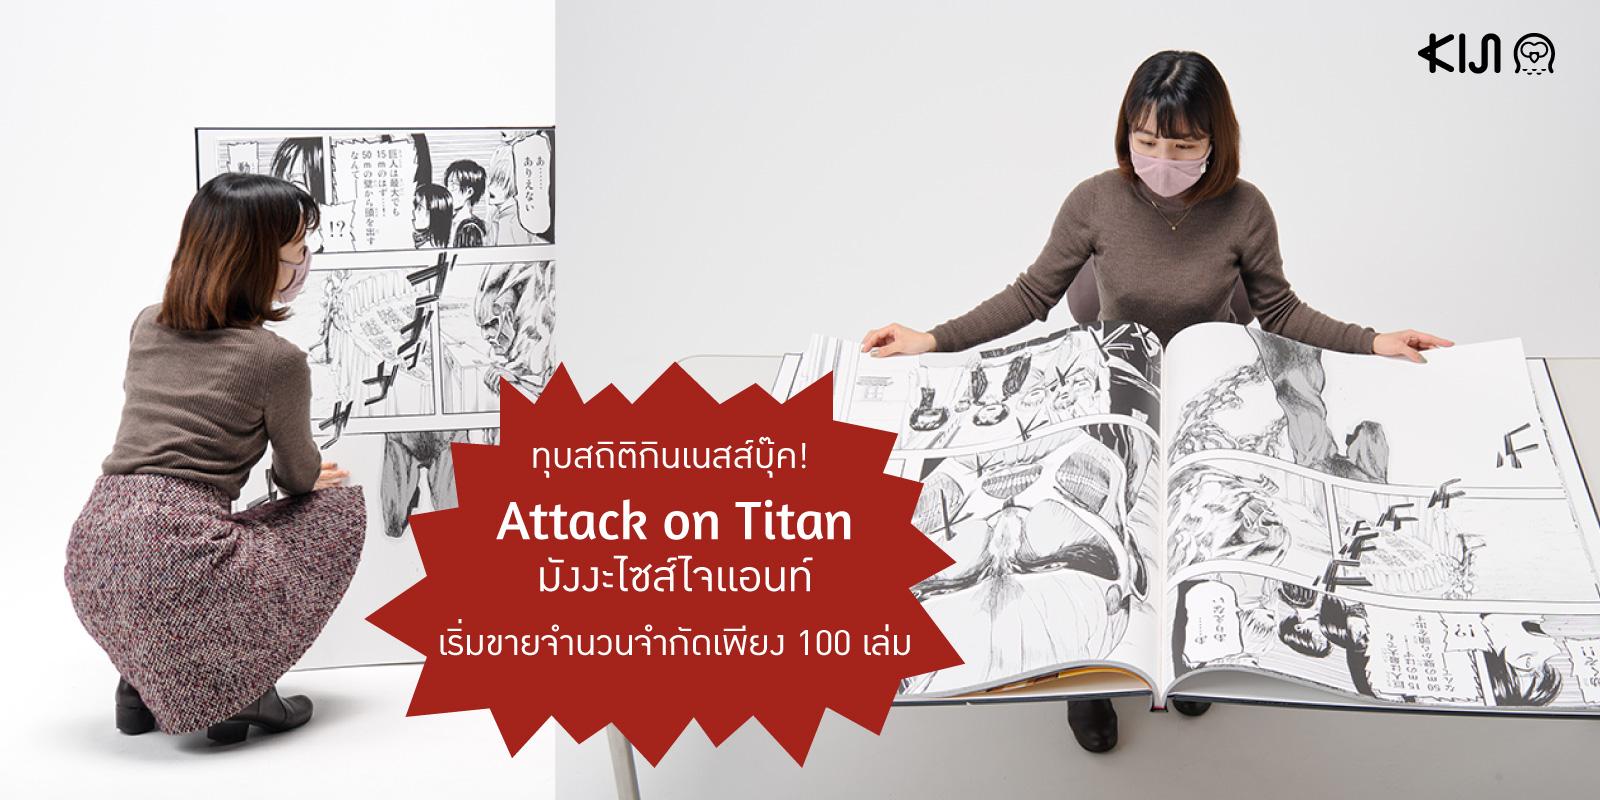 Attack on Titan มังงะไซส์ไจแอนท์